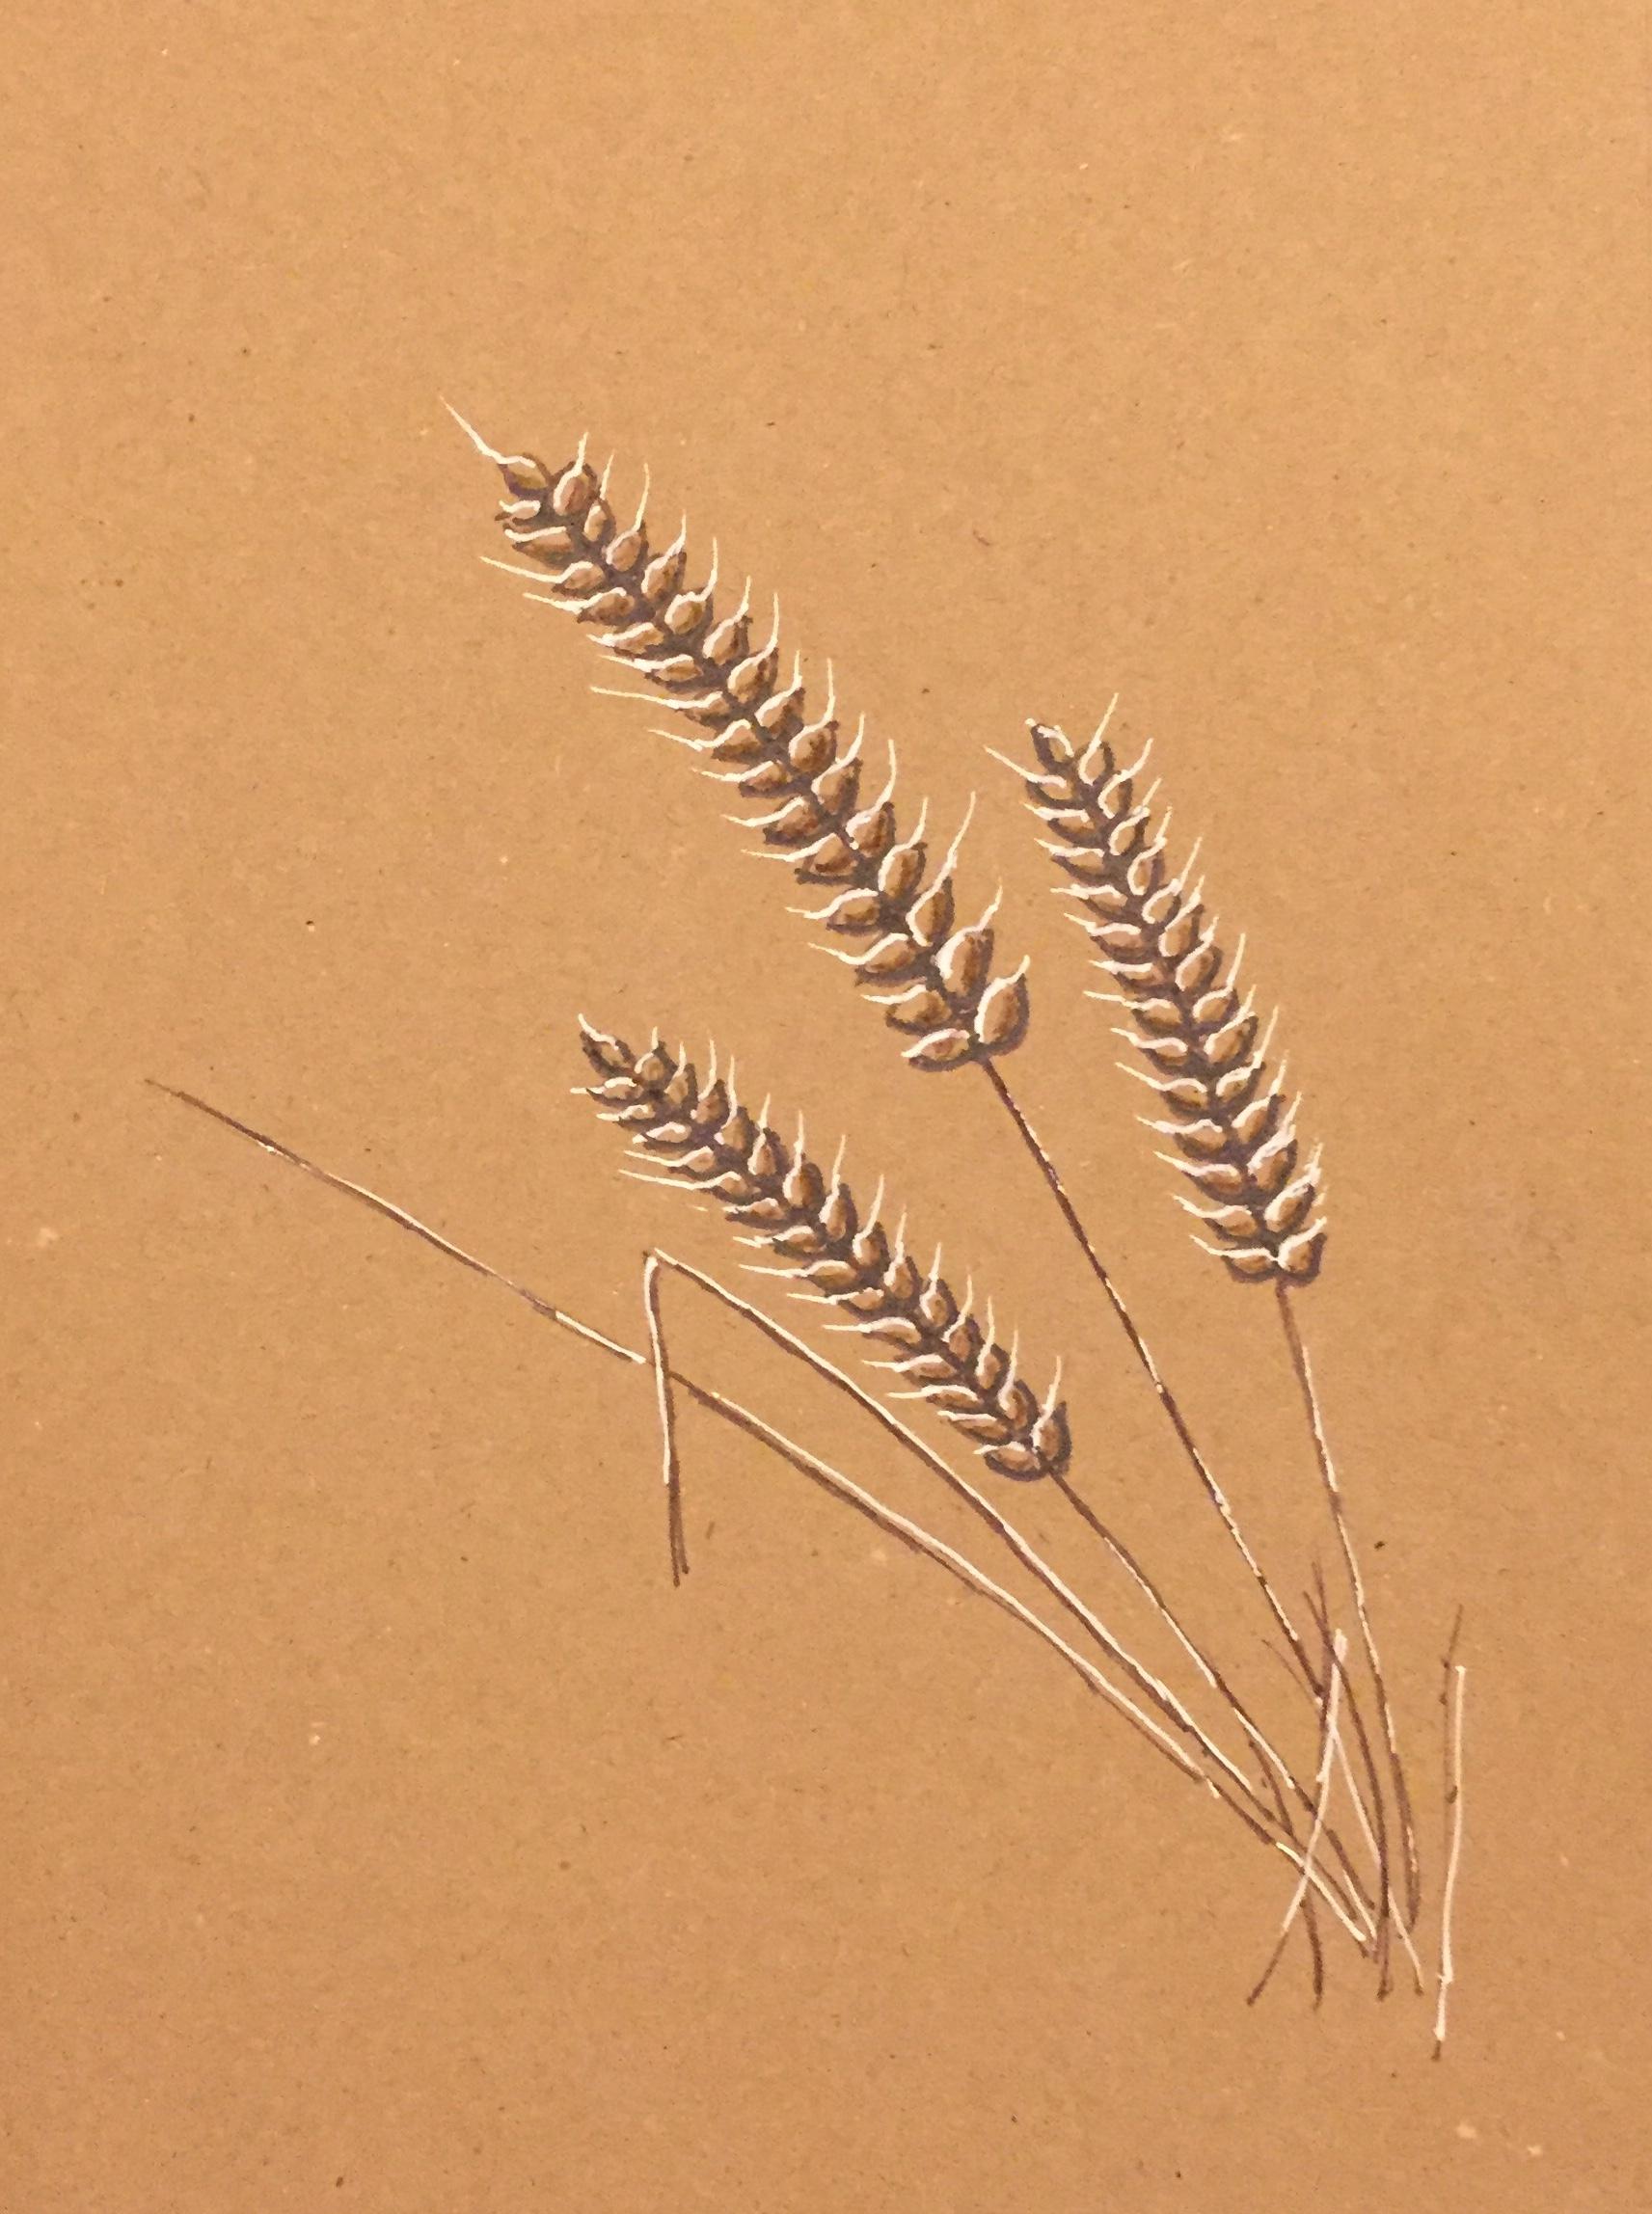 TJ grass.jpg